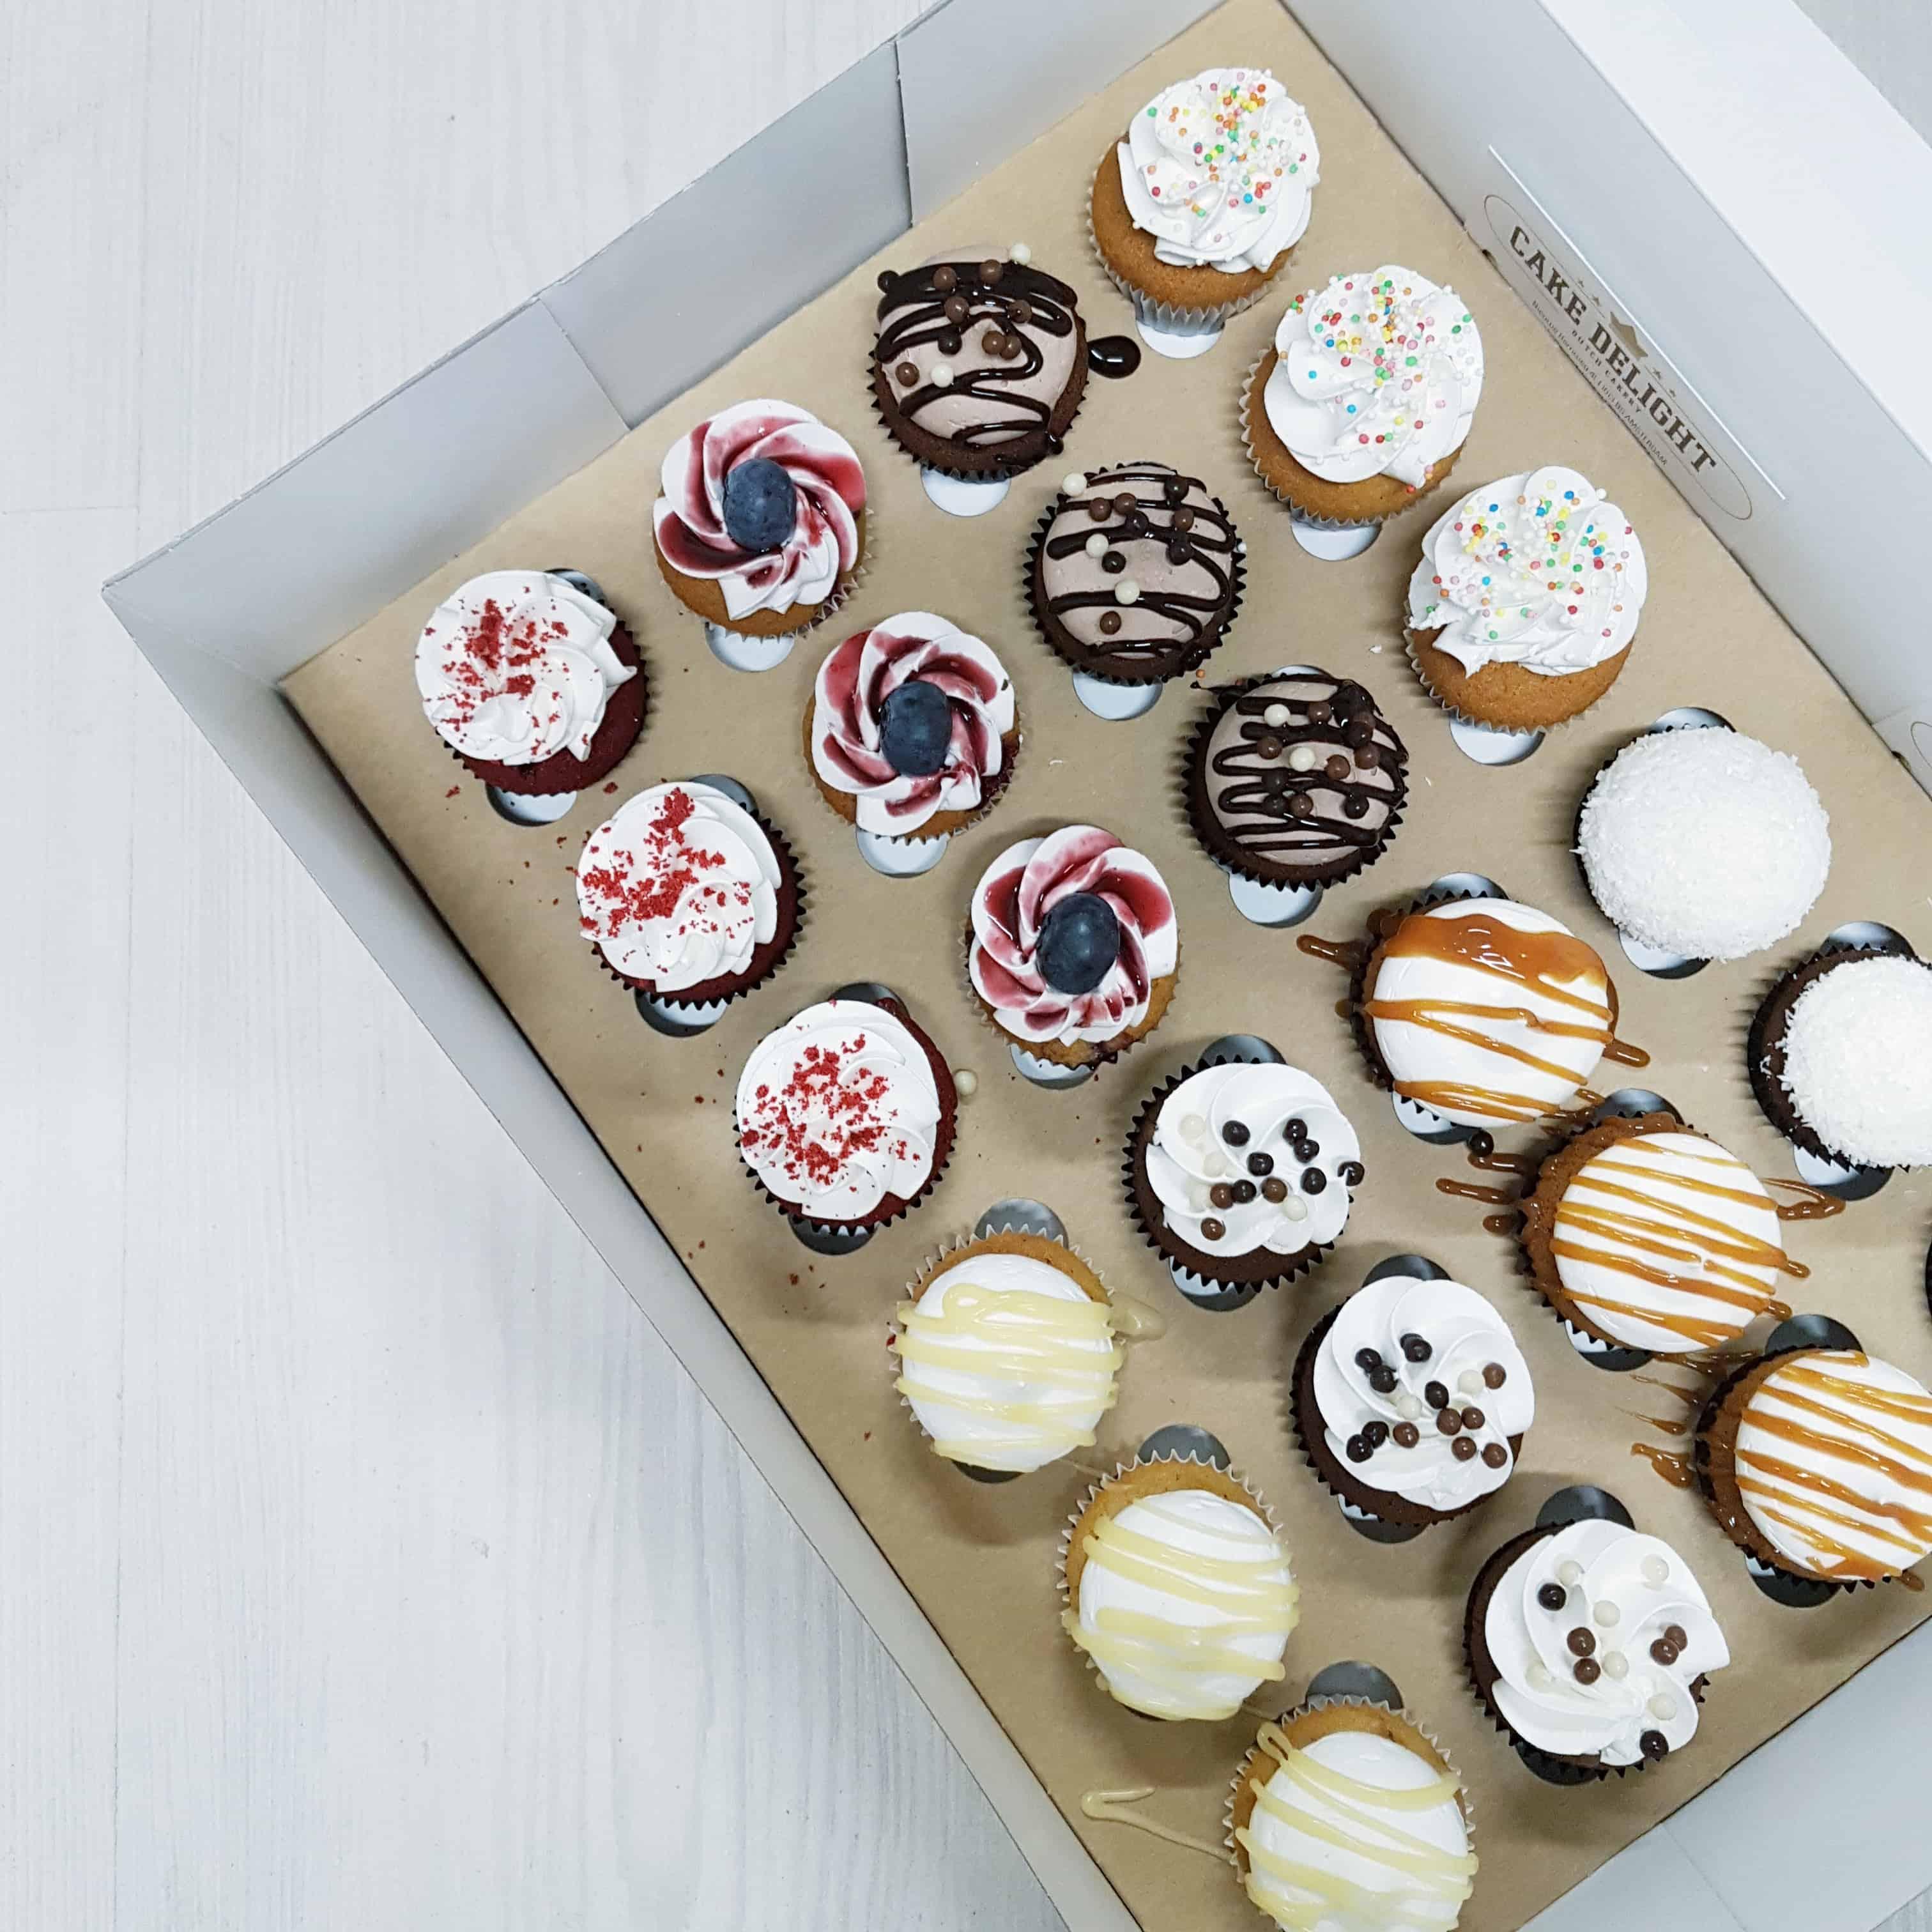 Cupcakes Amsterdam Bestel Je Cupcakes Taarten Online